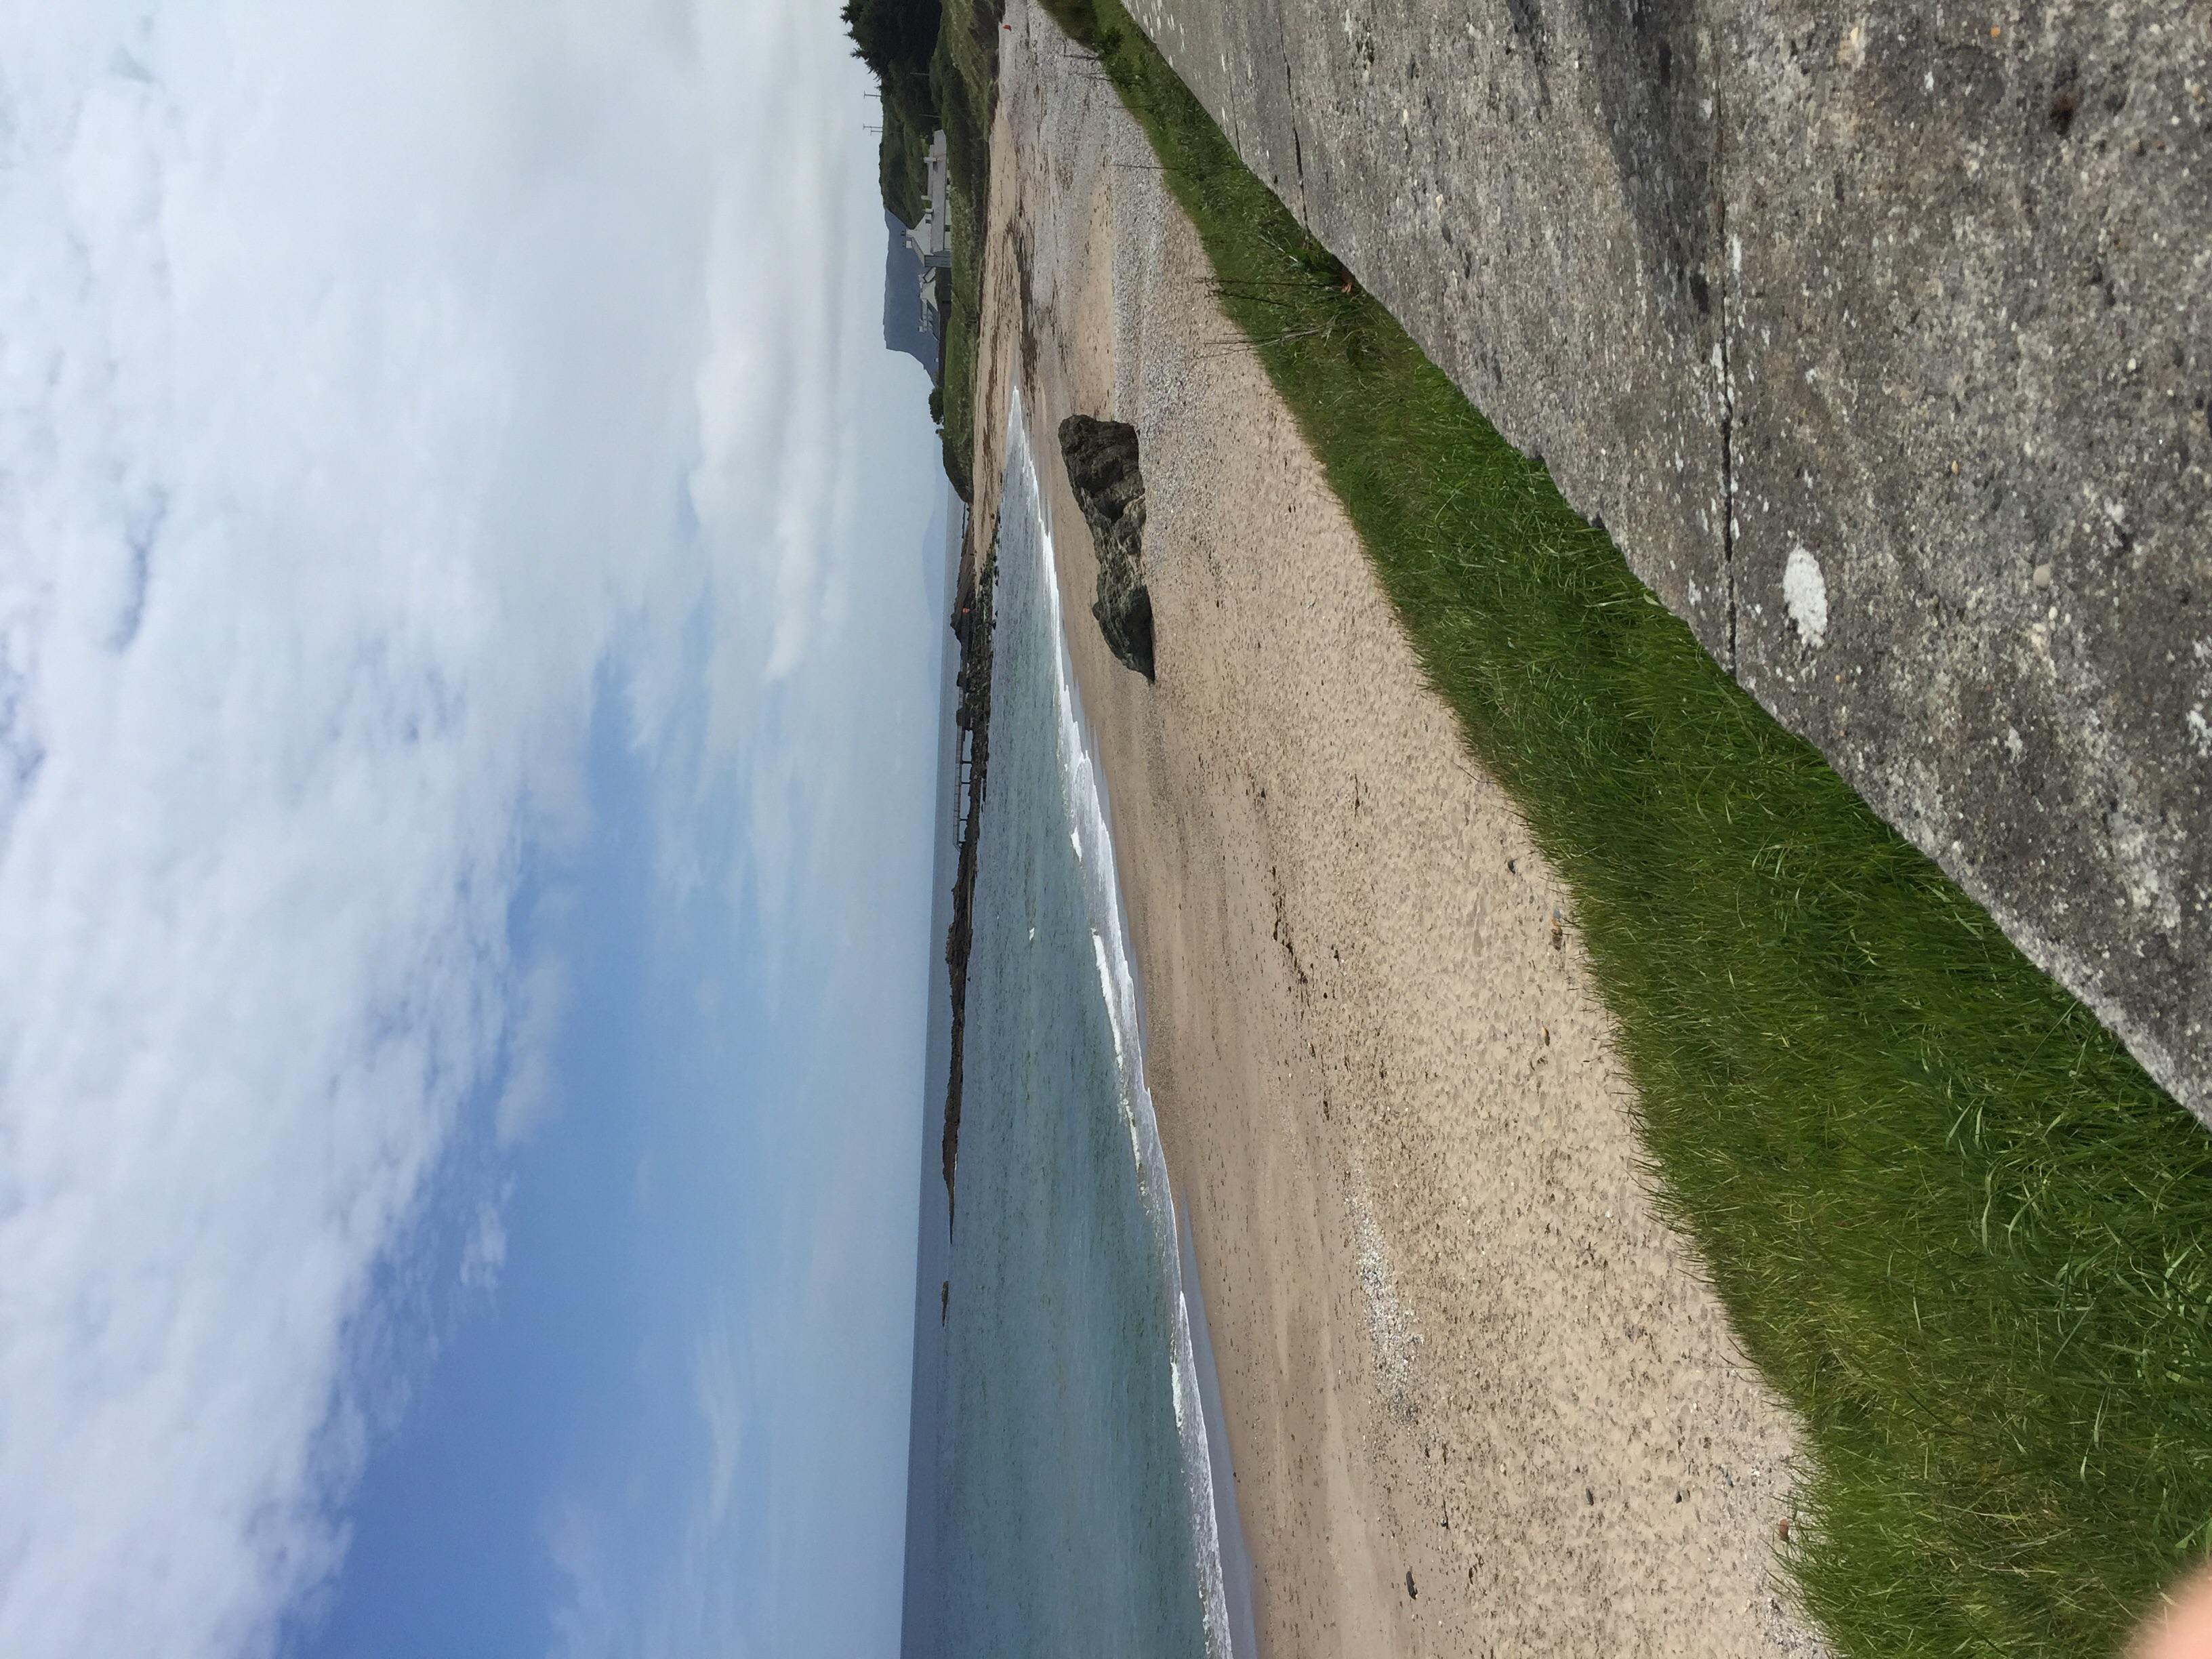 Ballycastle coast, where Paddy's family has a caravan(trailer to us Americans).